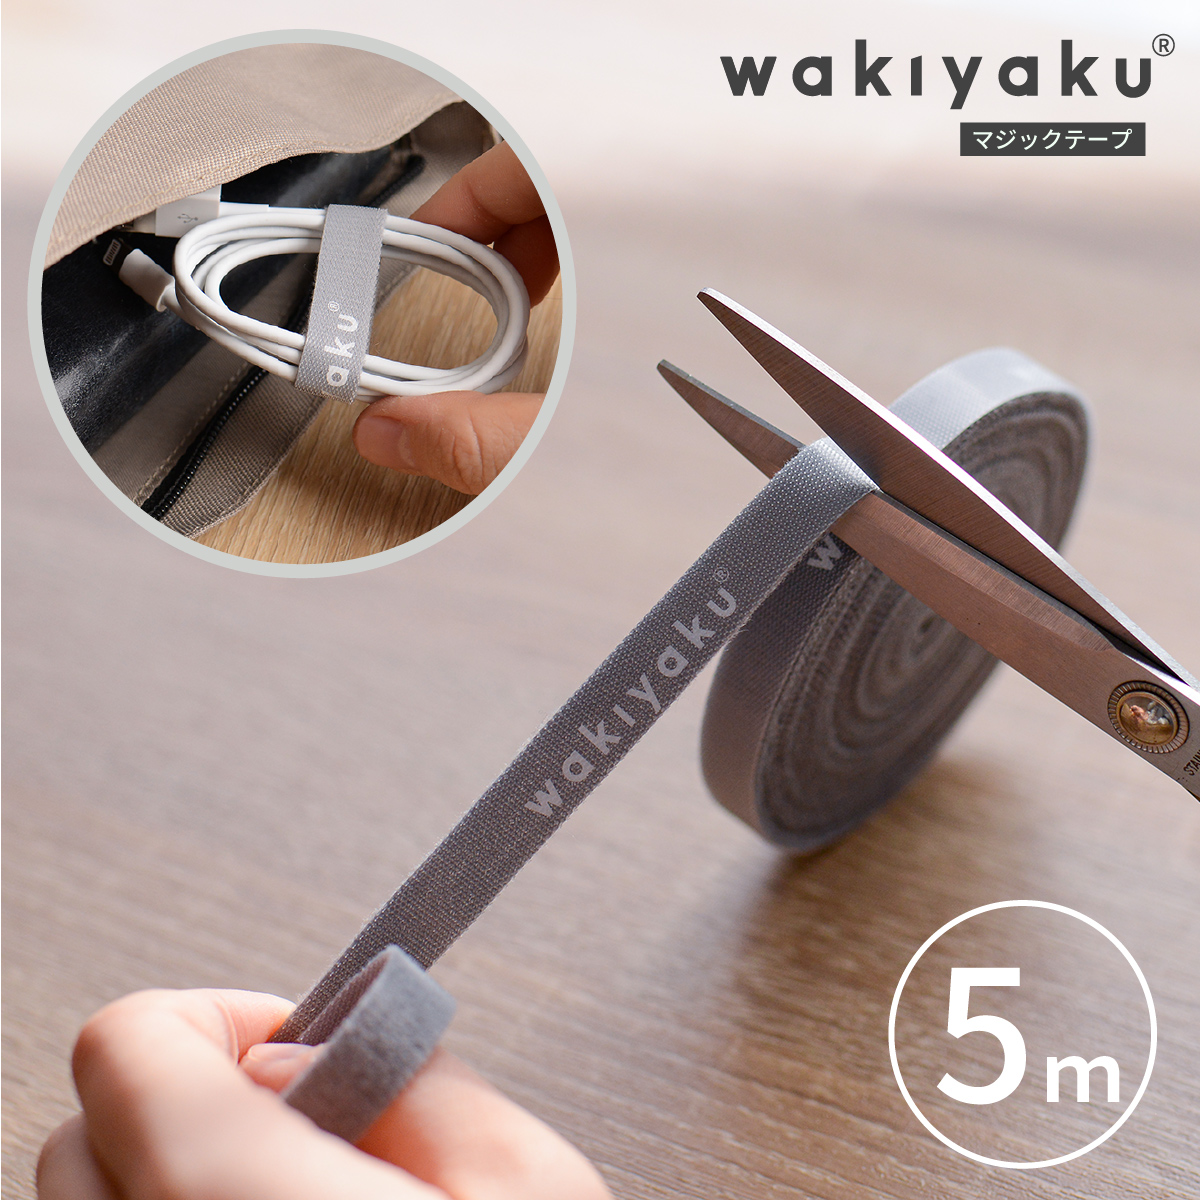 wakiyaku R 両面 直営店 マジックテープ 受注生産品 マジックバンド 5m 幅12mm 壁掛け コード固定両面テープ 防災 対策ネコポス送料無料 ケーブルまとめ 配線 長さ5mファスナー